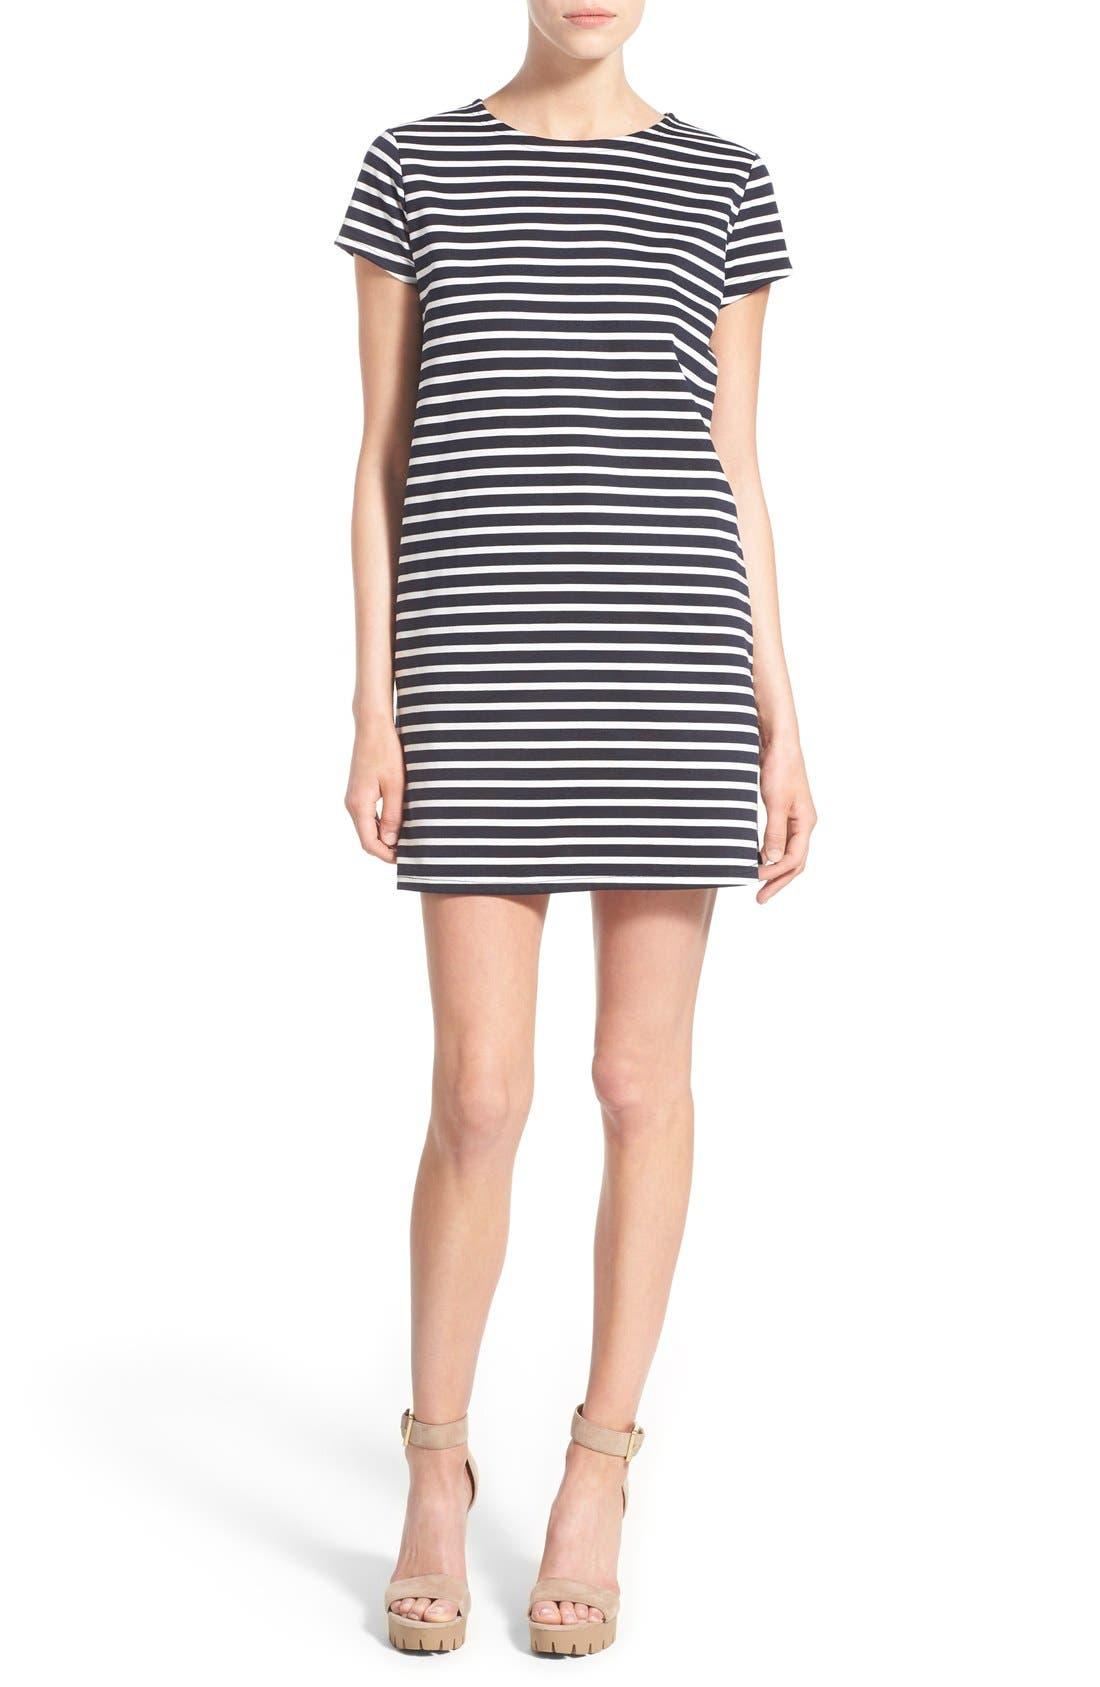 Alternate Image 1 Selected - Missguided Stripe Short Sleeve Shift Dress